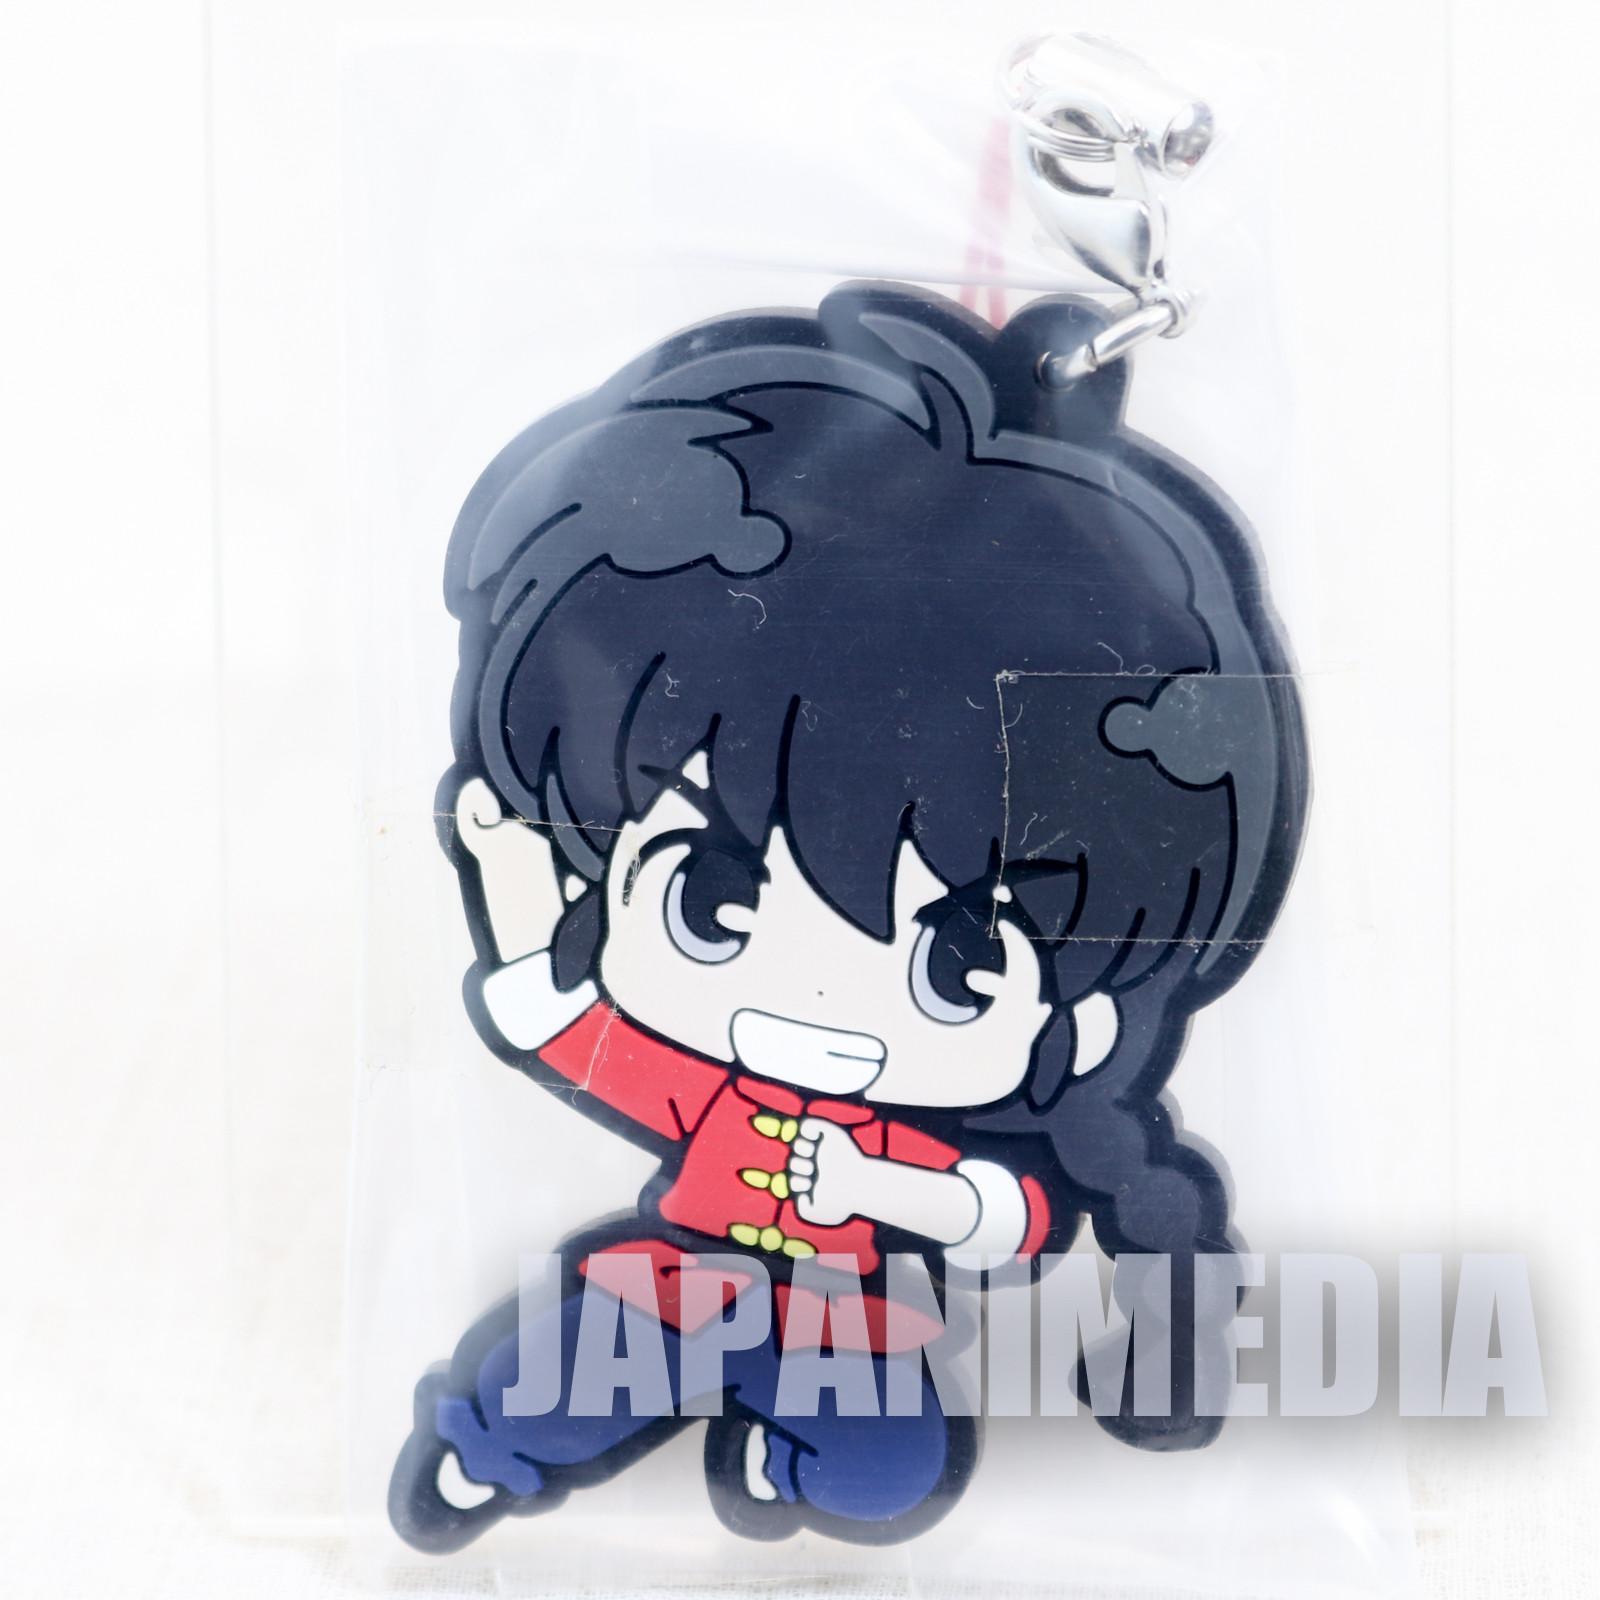 Ranma 1/2 Male Ranma Saotome #3 Mascot Rubber Strap JAPAN ANIME MANGA